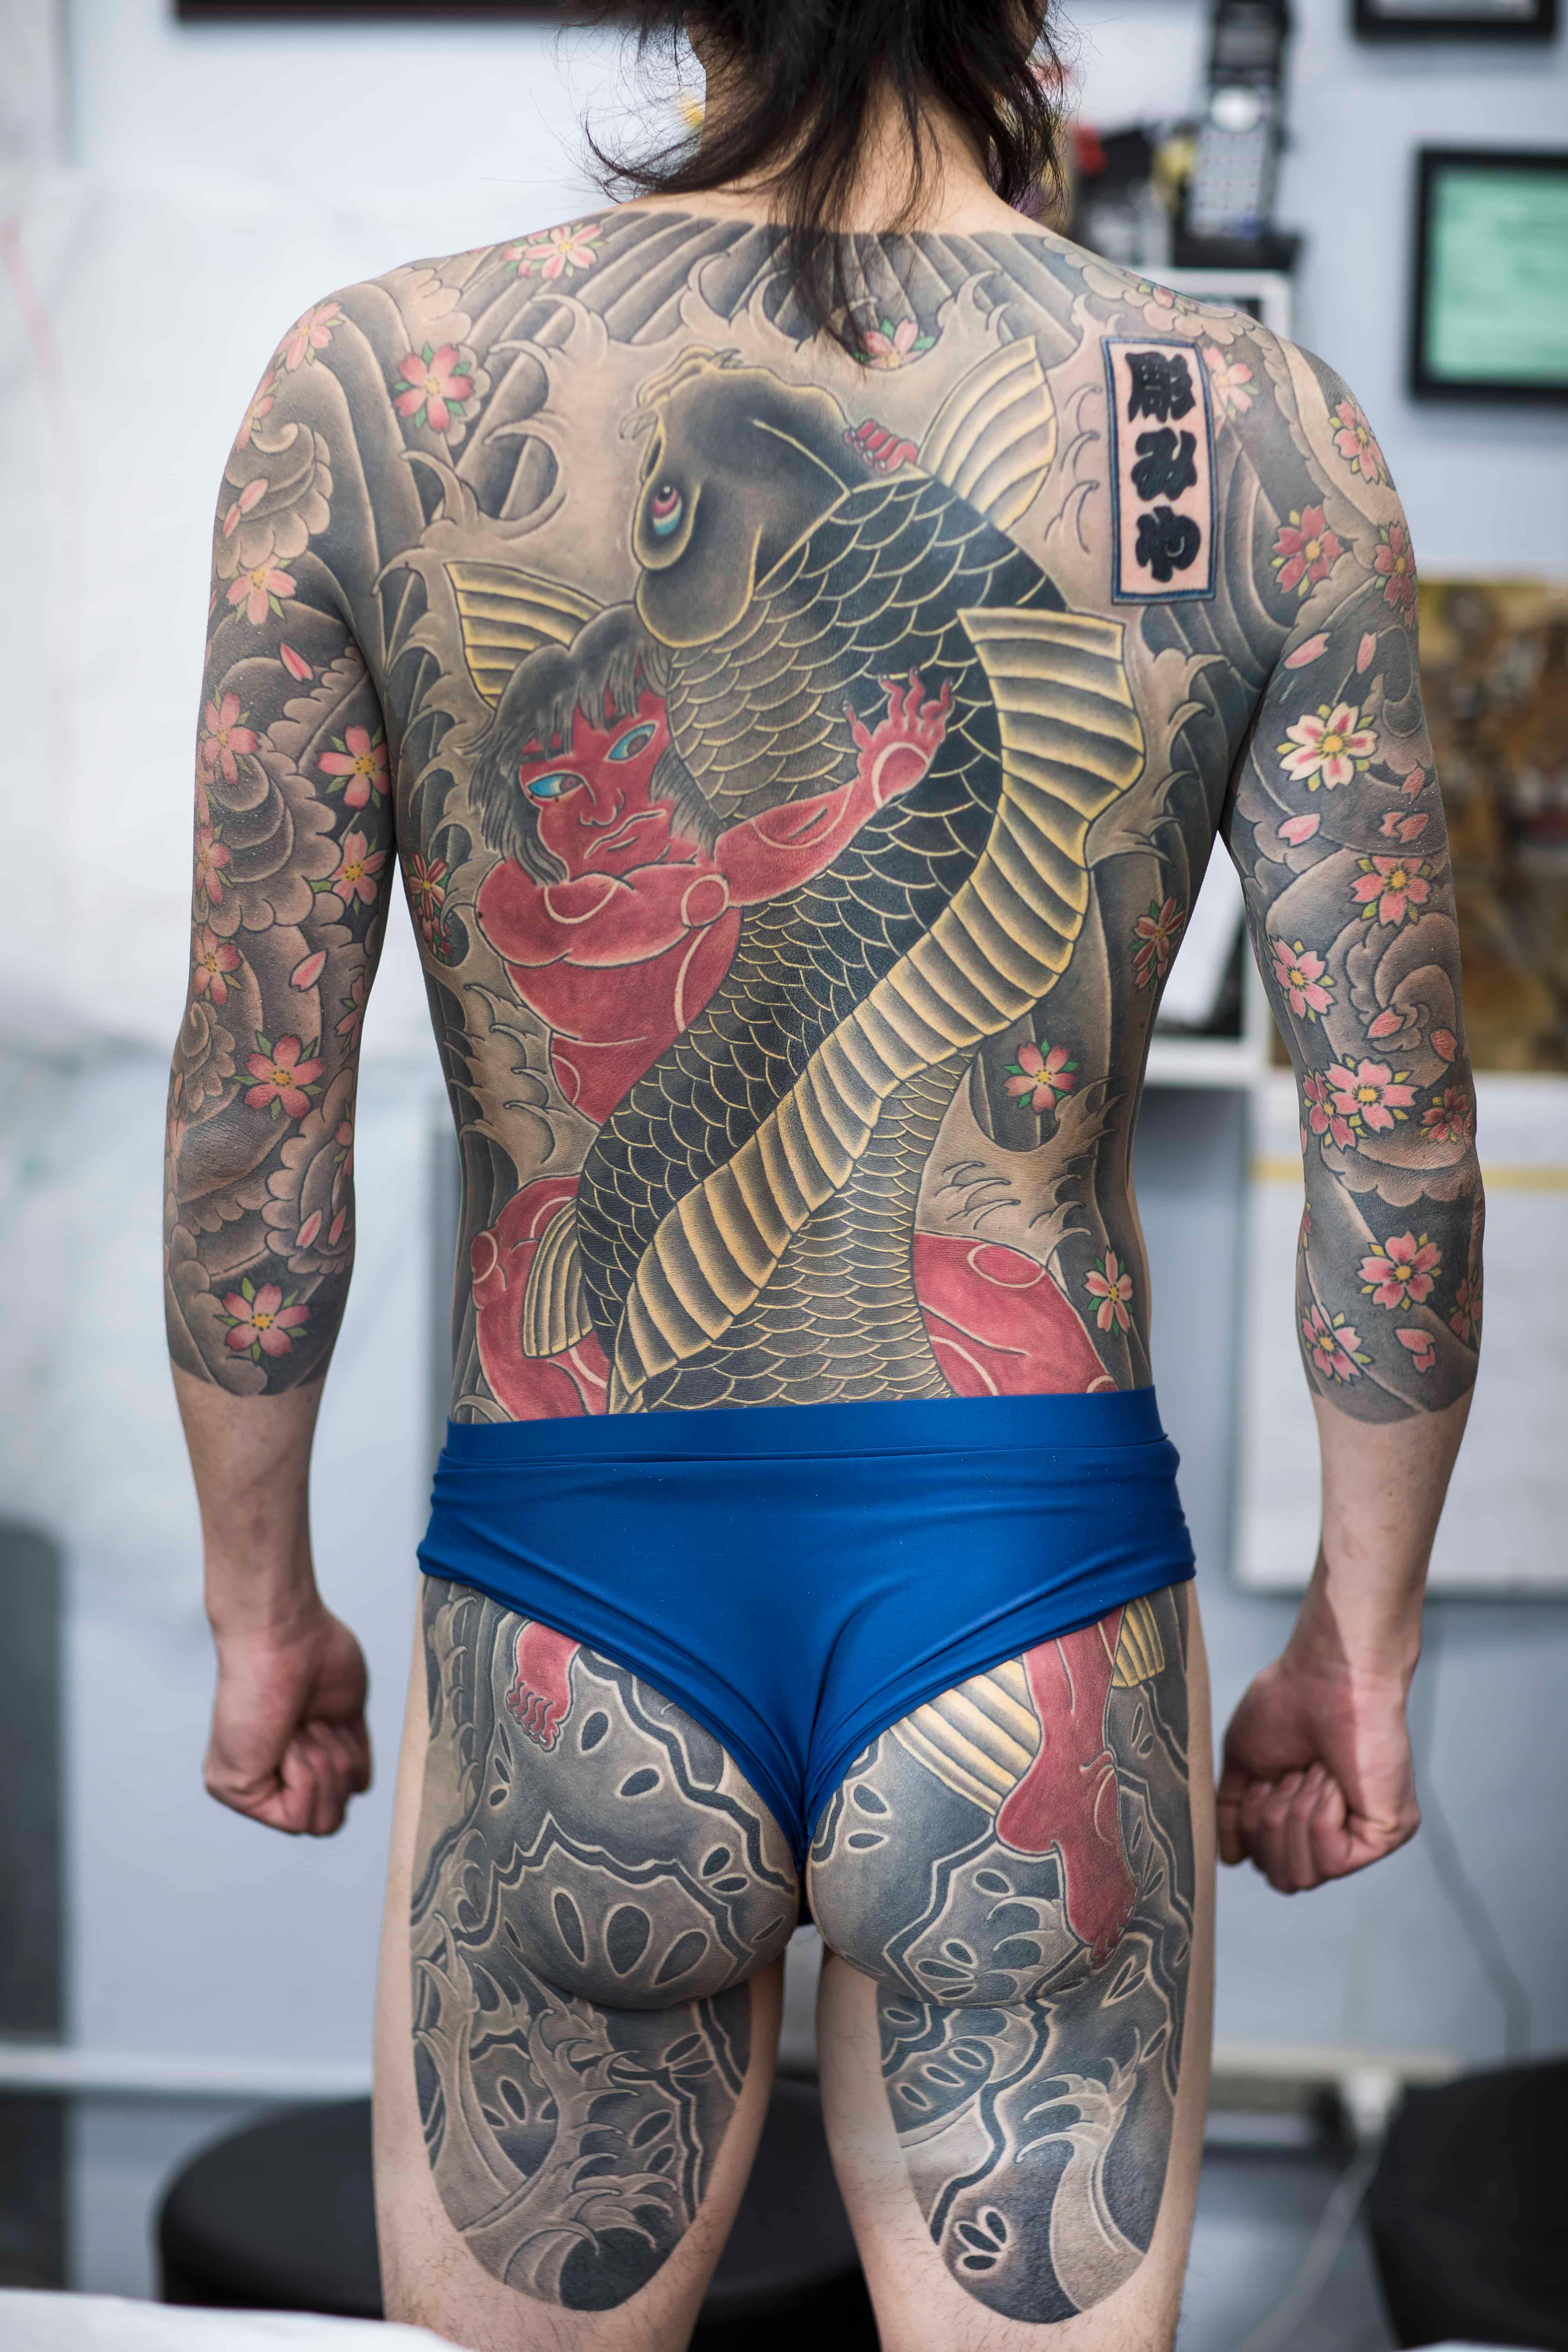 afd7a5e1d27b0 Funhouse Tattoo 1453 Garnet Avenue San Diego, CA Tattoos & Piercing ...